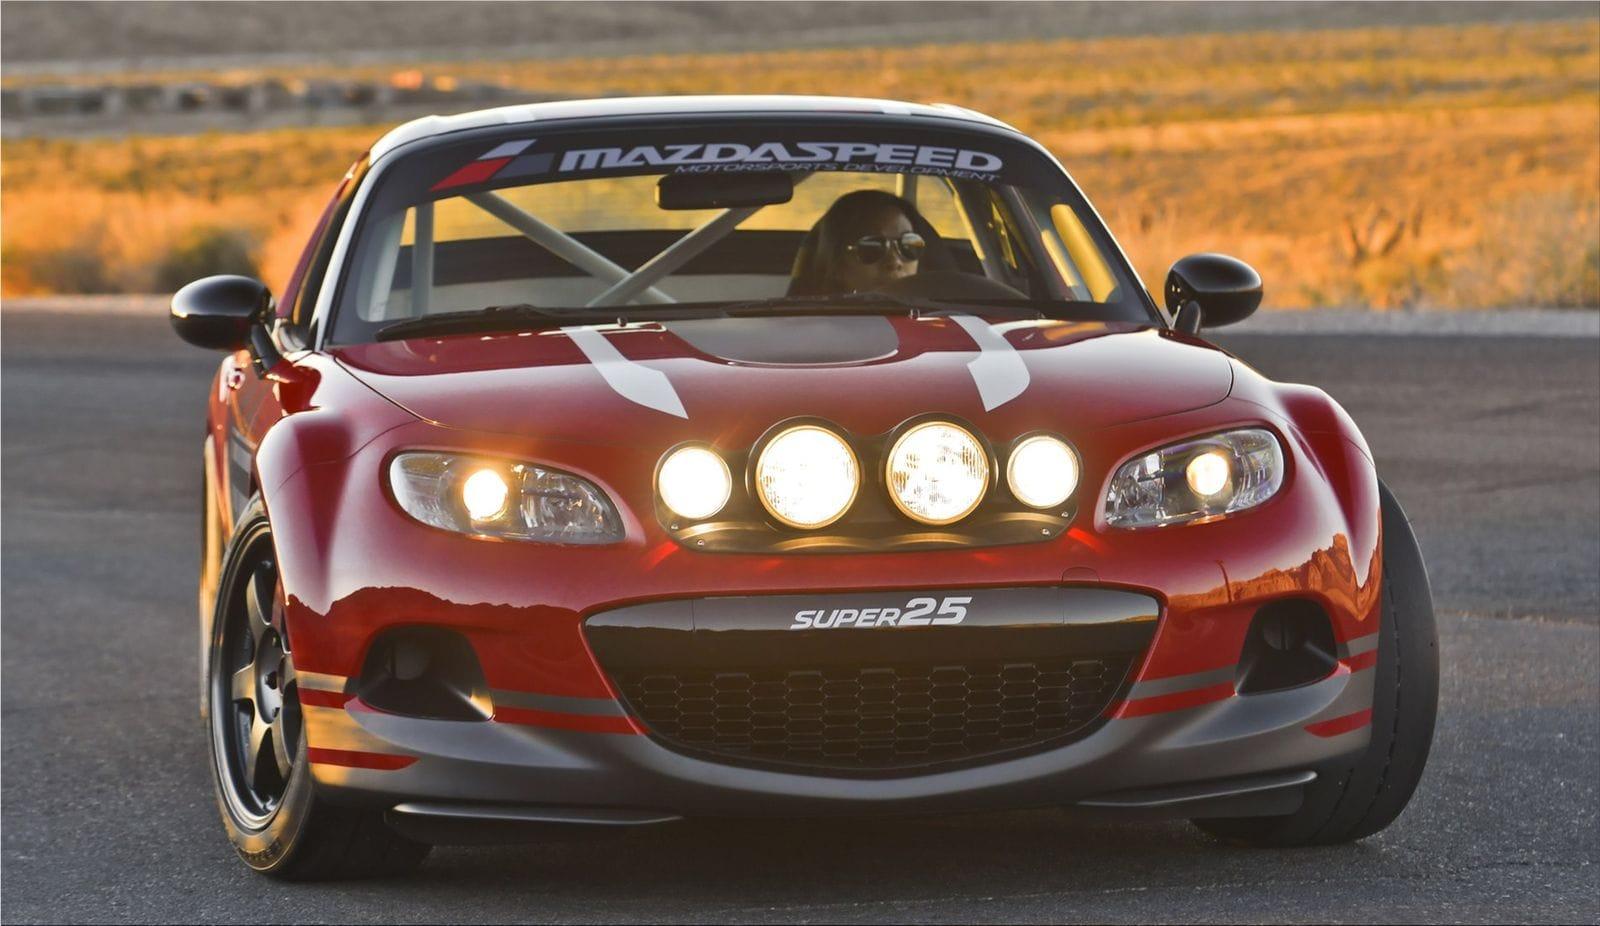 Mazda MX-5 Super 25 Concept on 17-inch Volk Racing T37|Mazda car ...